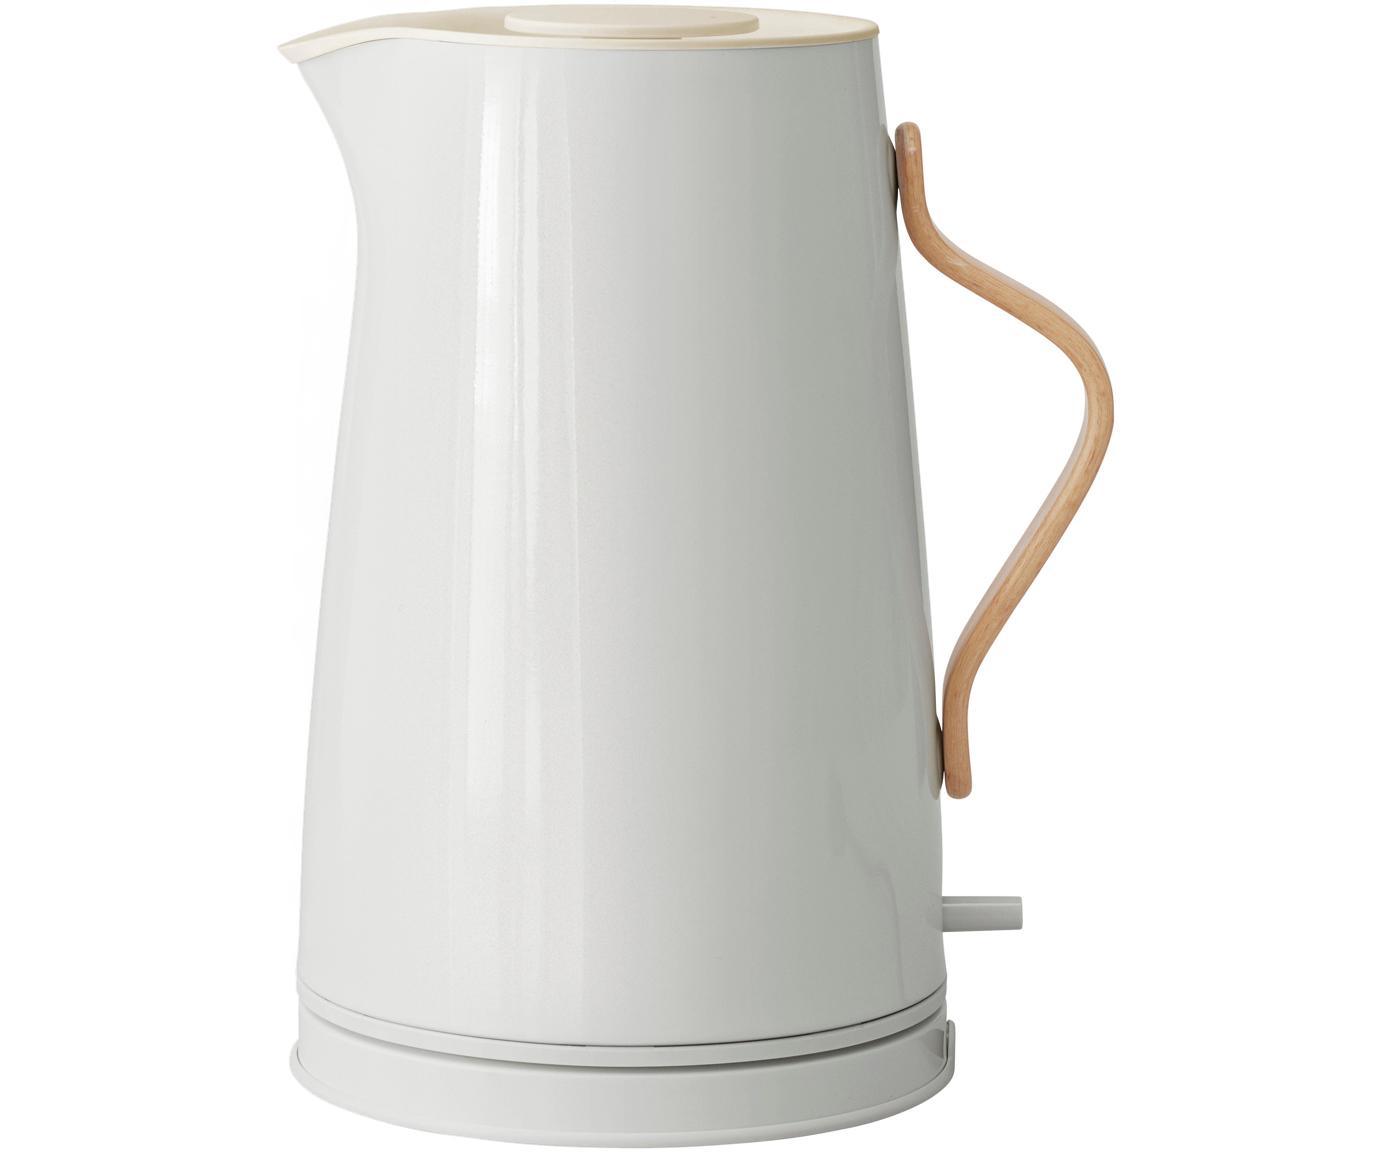 Wasserkocher Emma in Kalkweiss glänzend, Griff: Buchenholz, Kalkweiss, 1.2 L